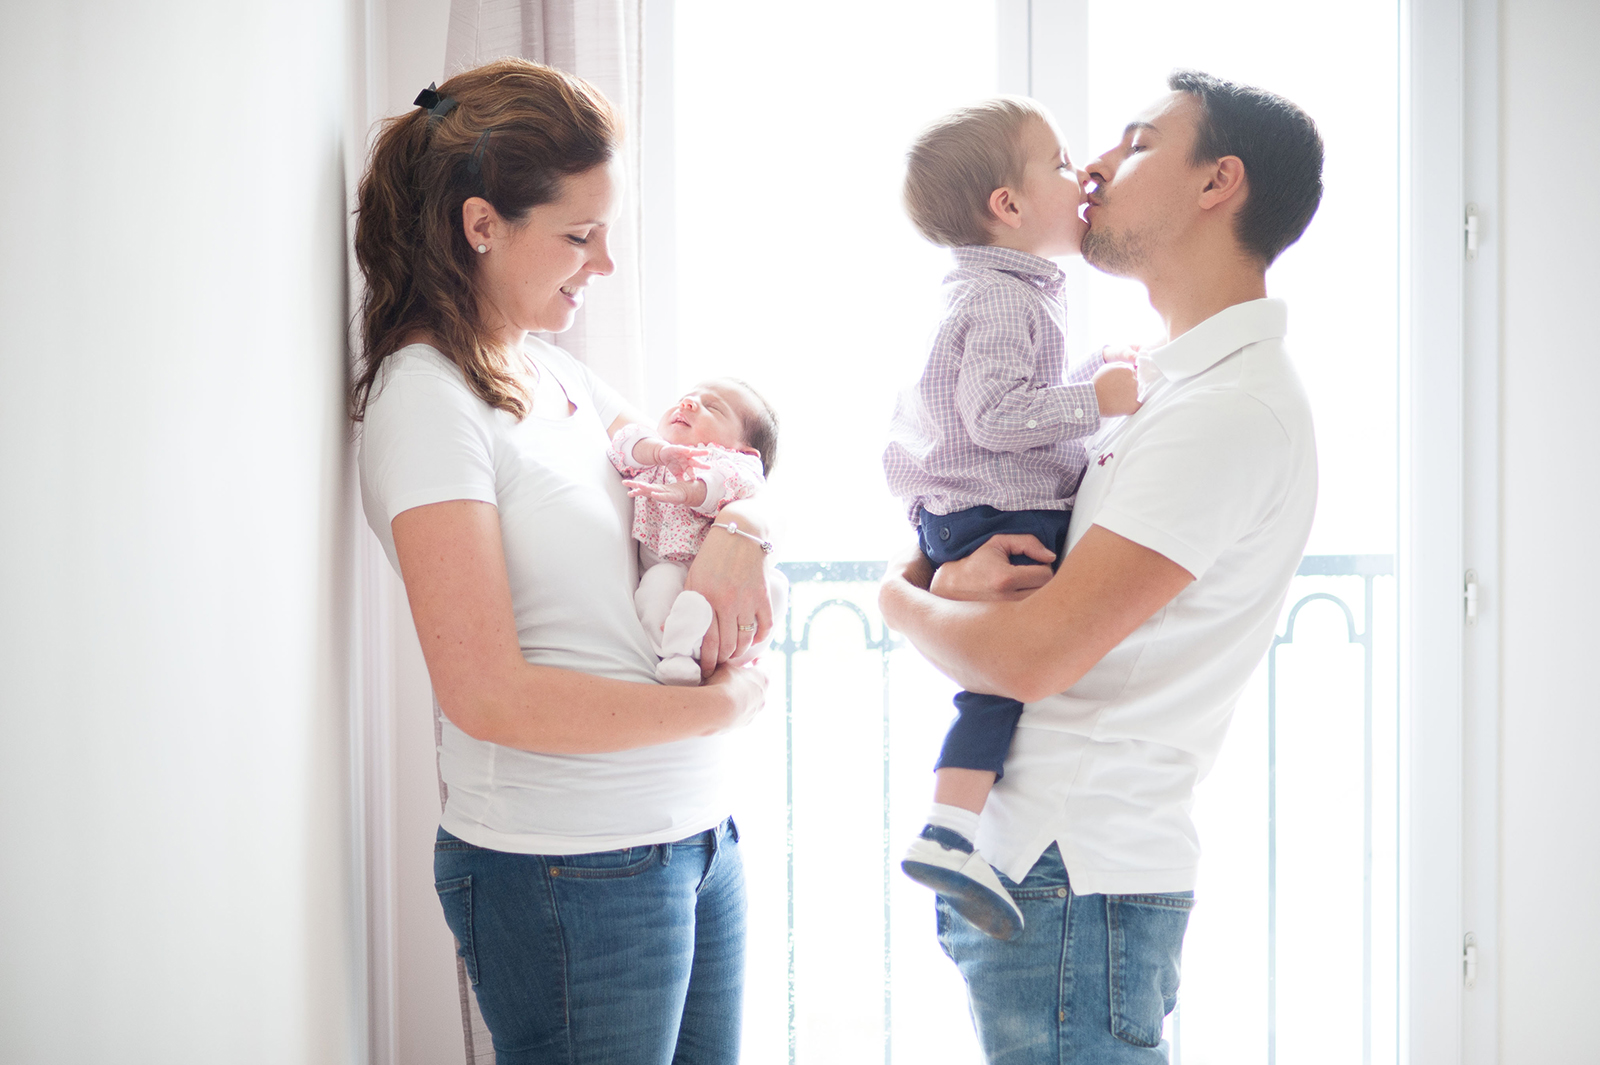 seance-photo-famille-photo-grossesse-photo-bébé-naissance-sabrina-godemert-photographe-seine-et-marne023